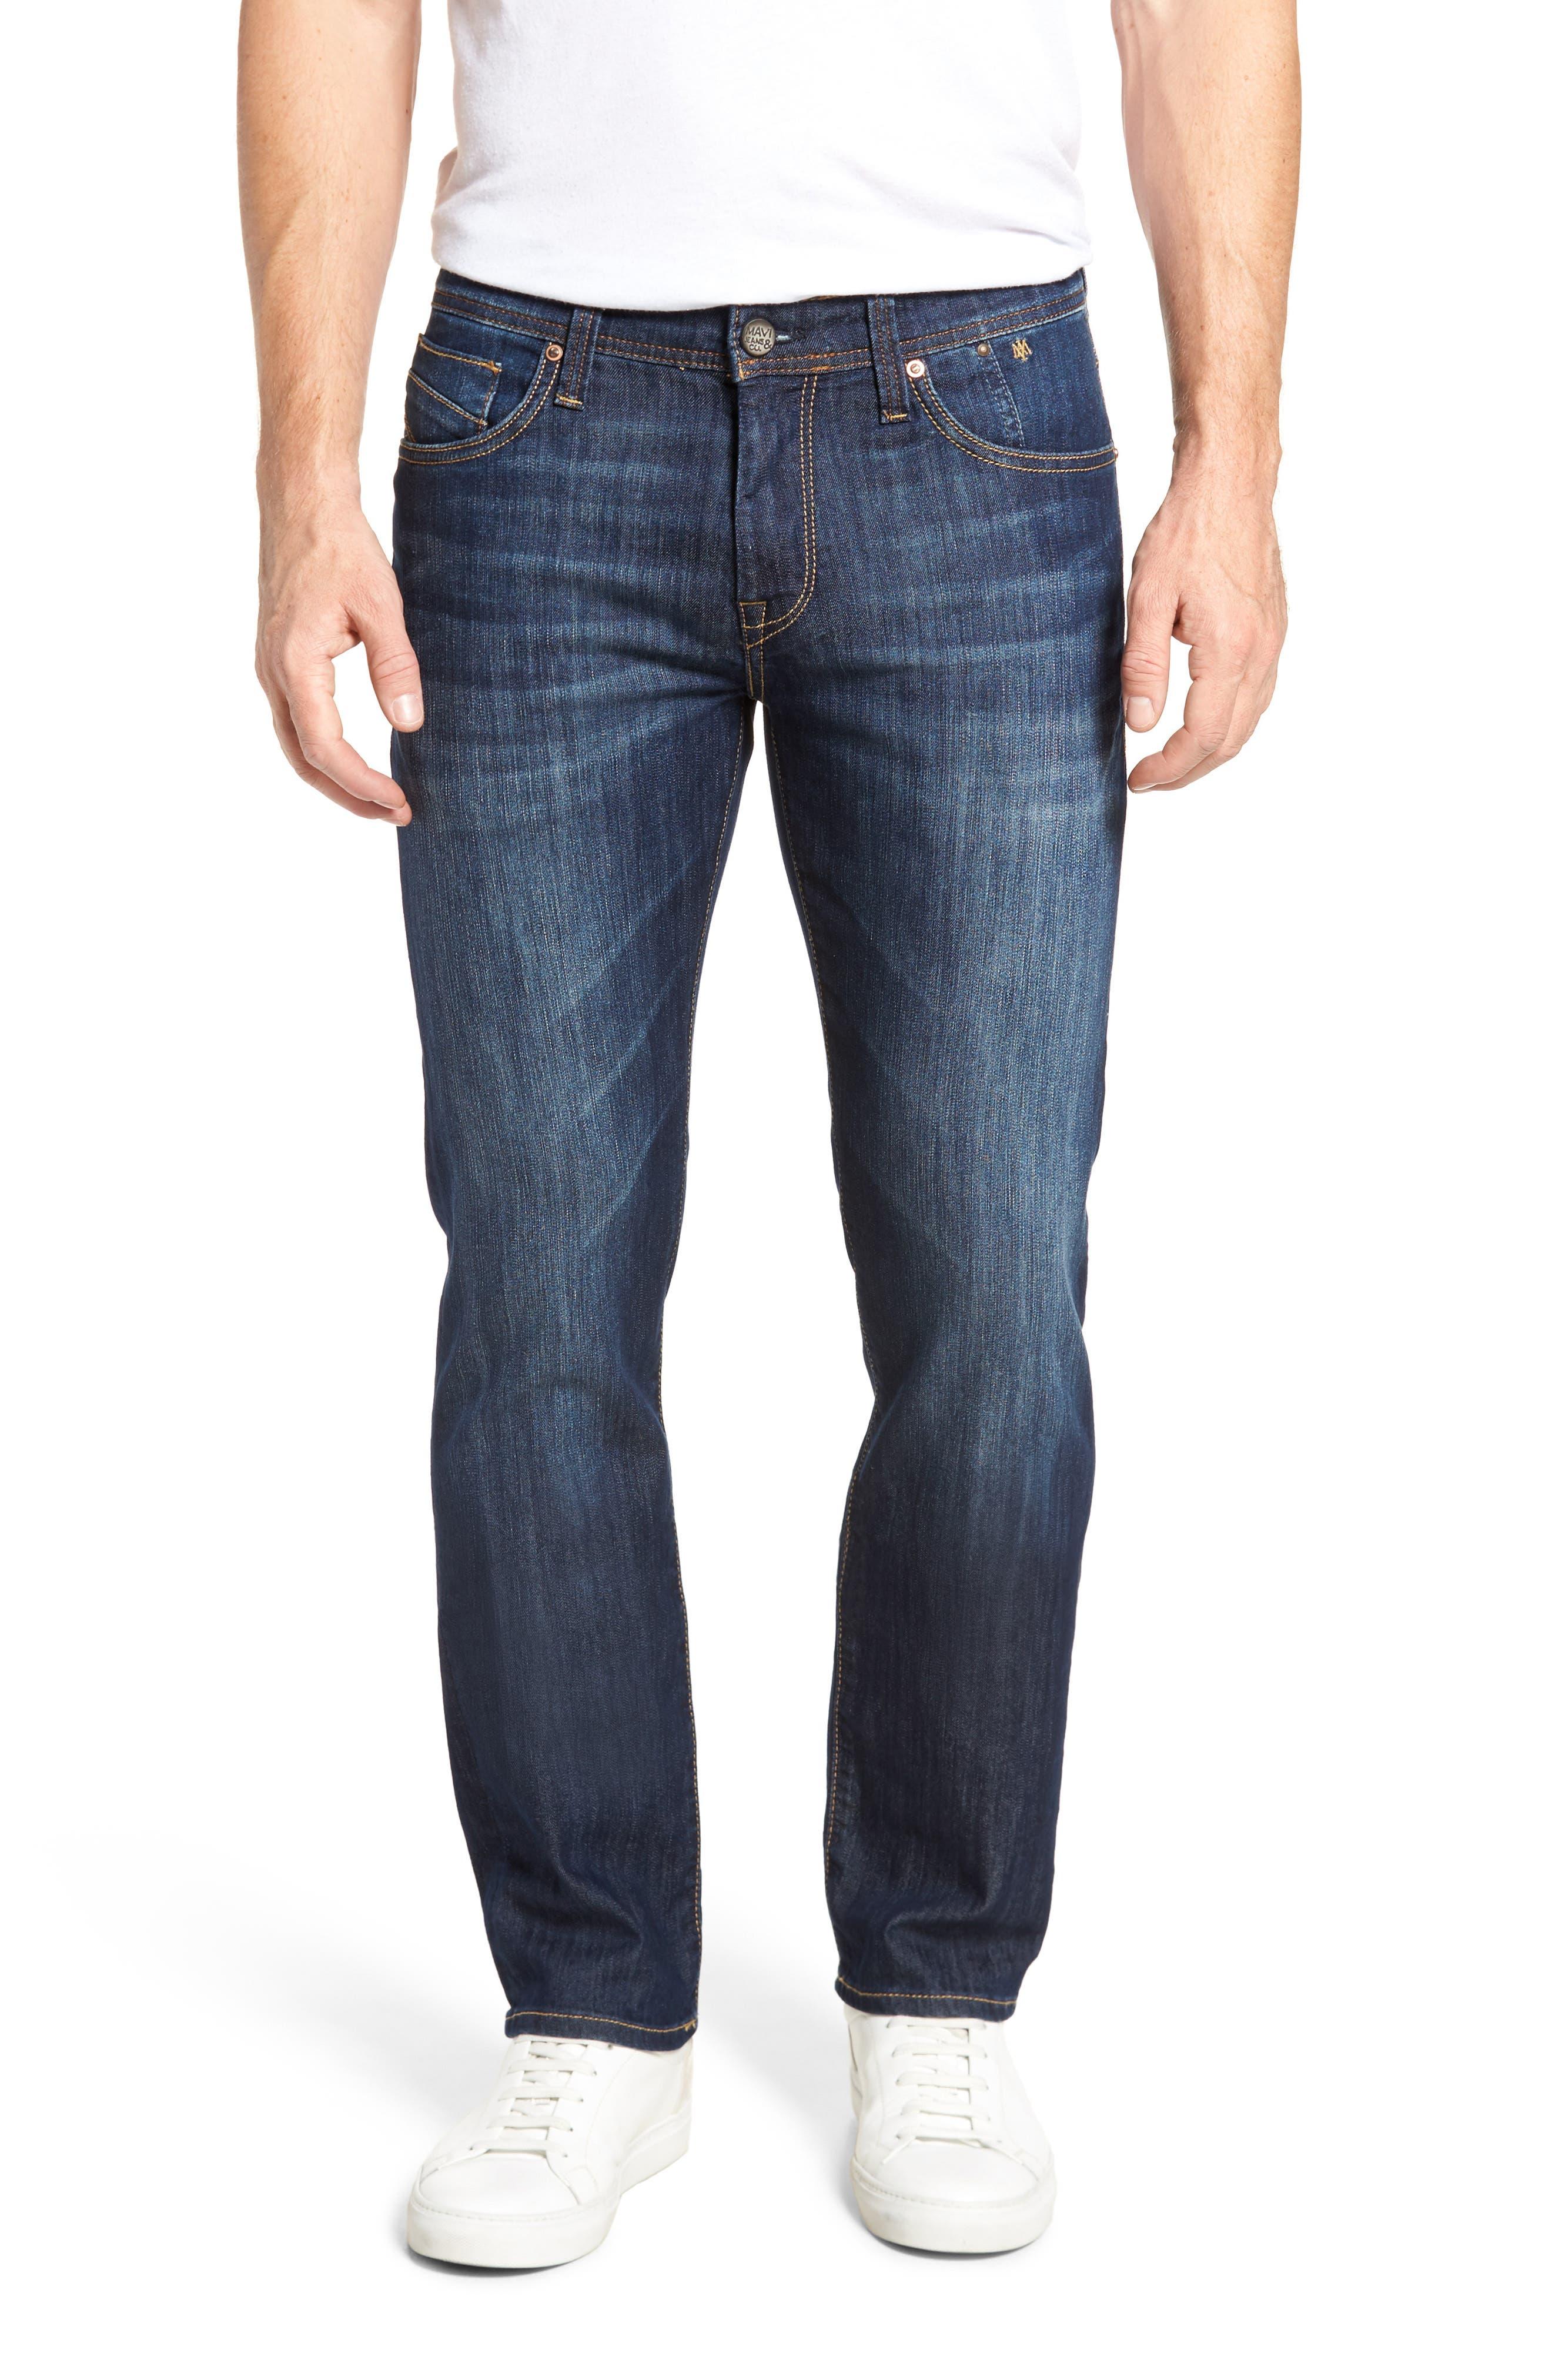 MAVI JEANS Zach Straight Leg Jeans, Main, color, DARK MAUI